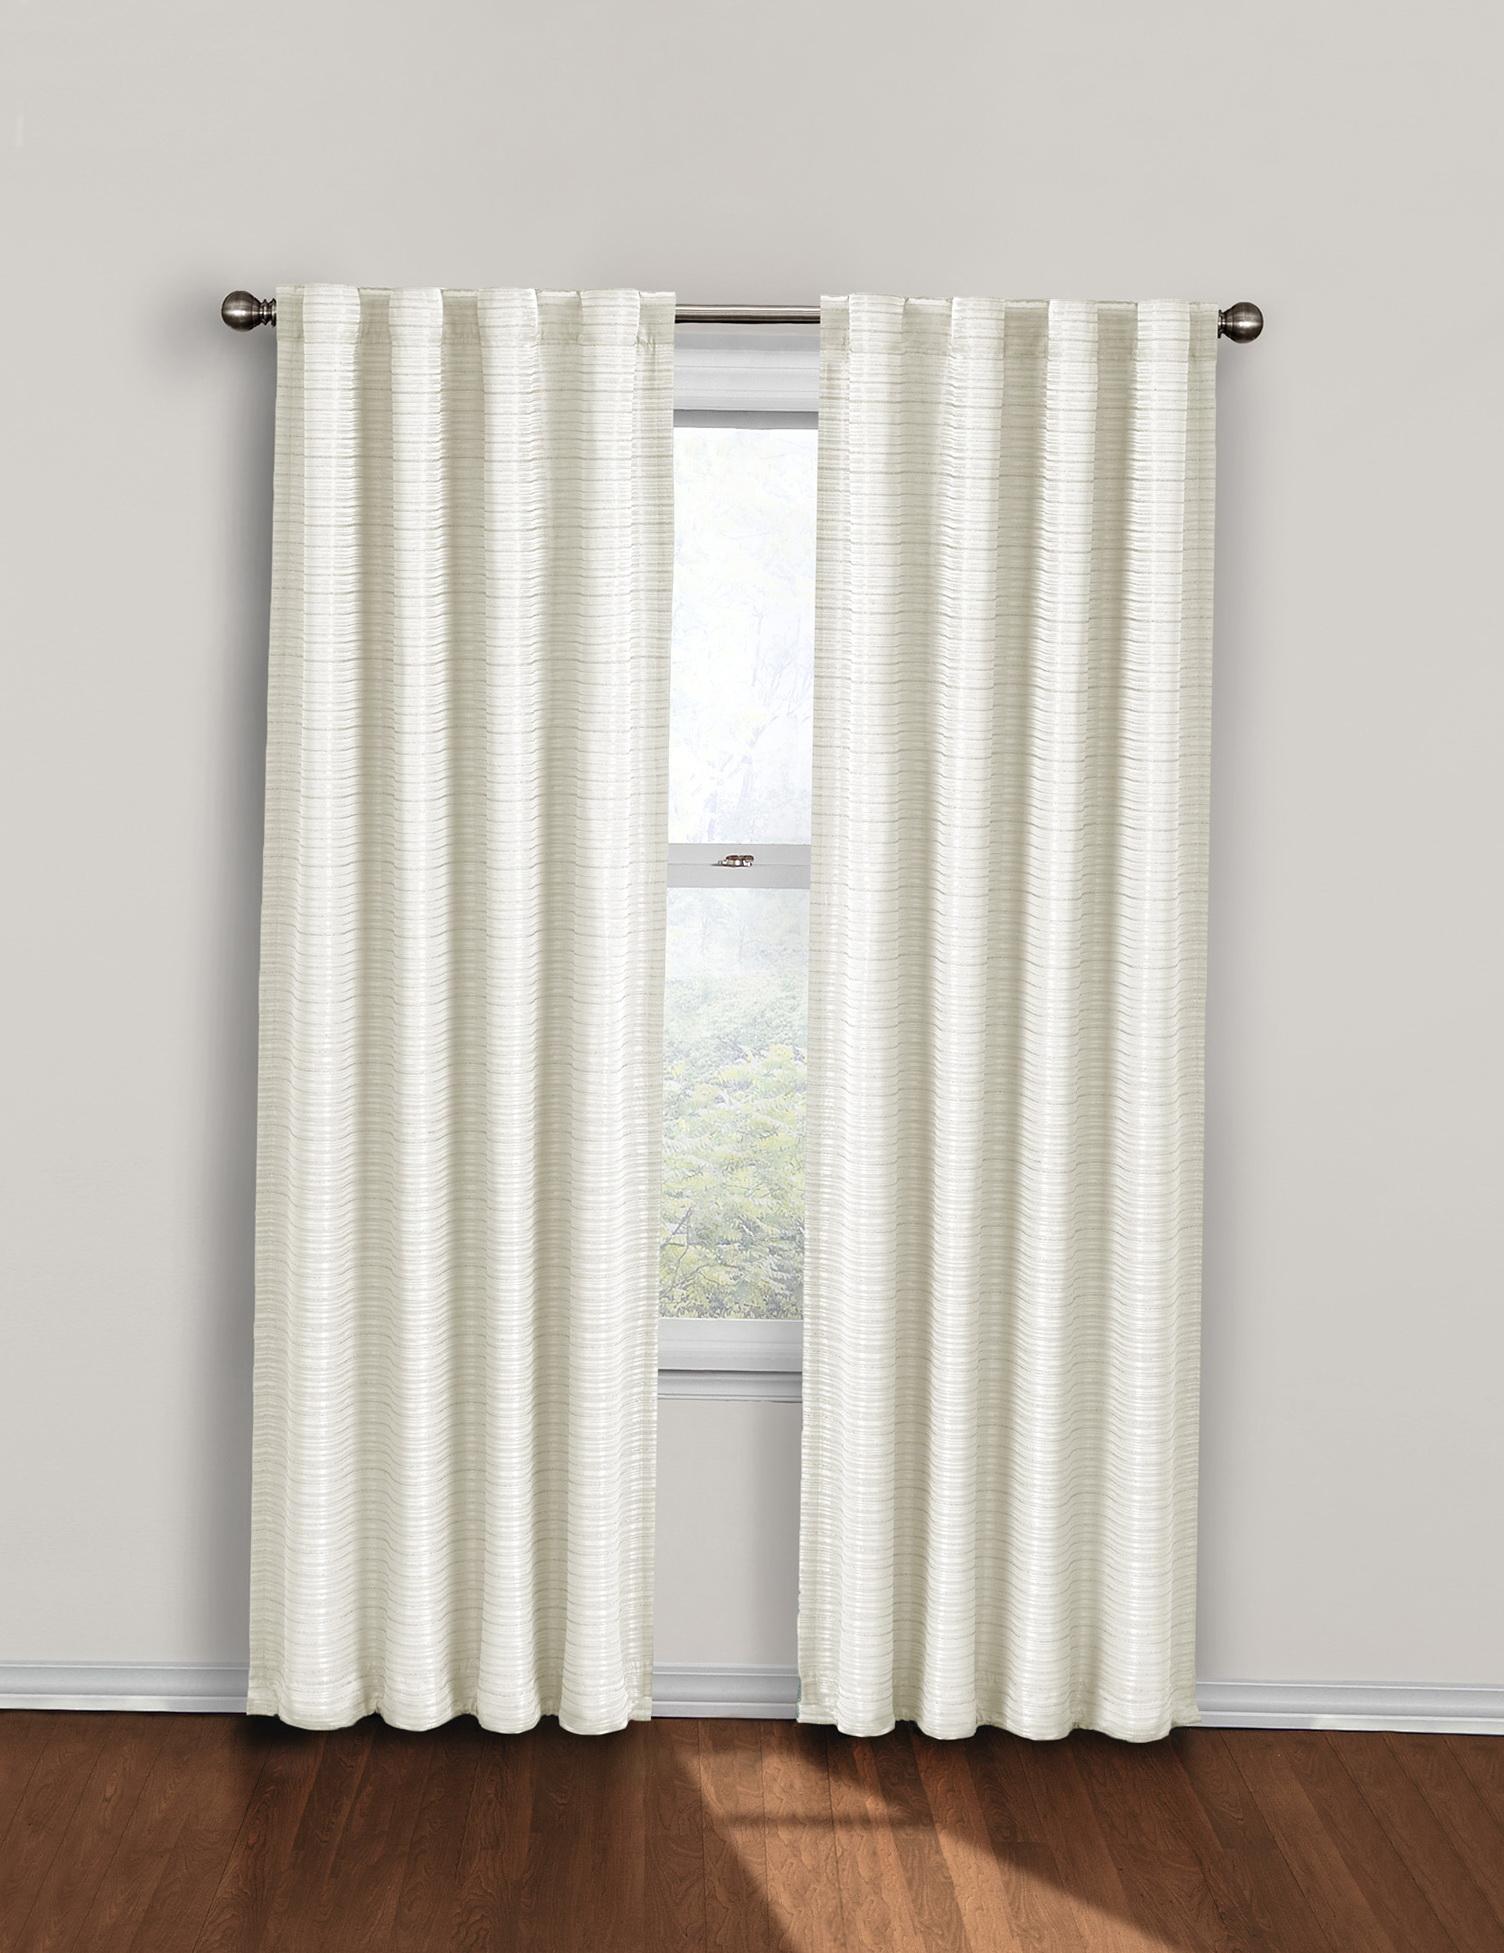 Eclipse Blackout Curtains Walmart Home Design Ideas